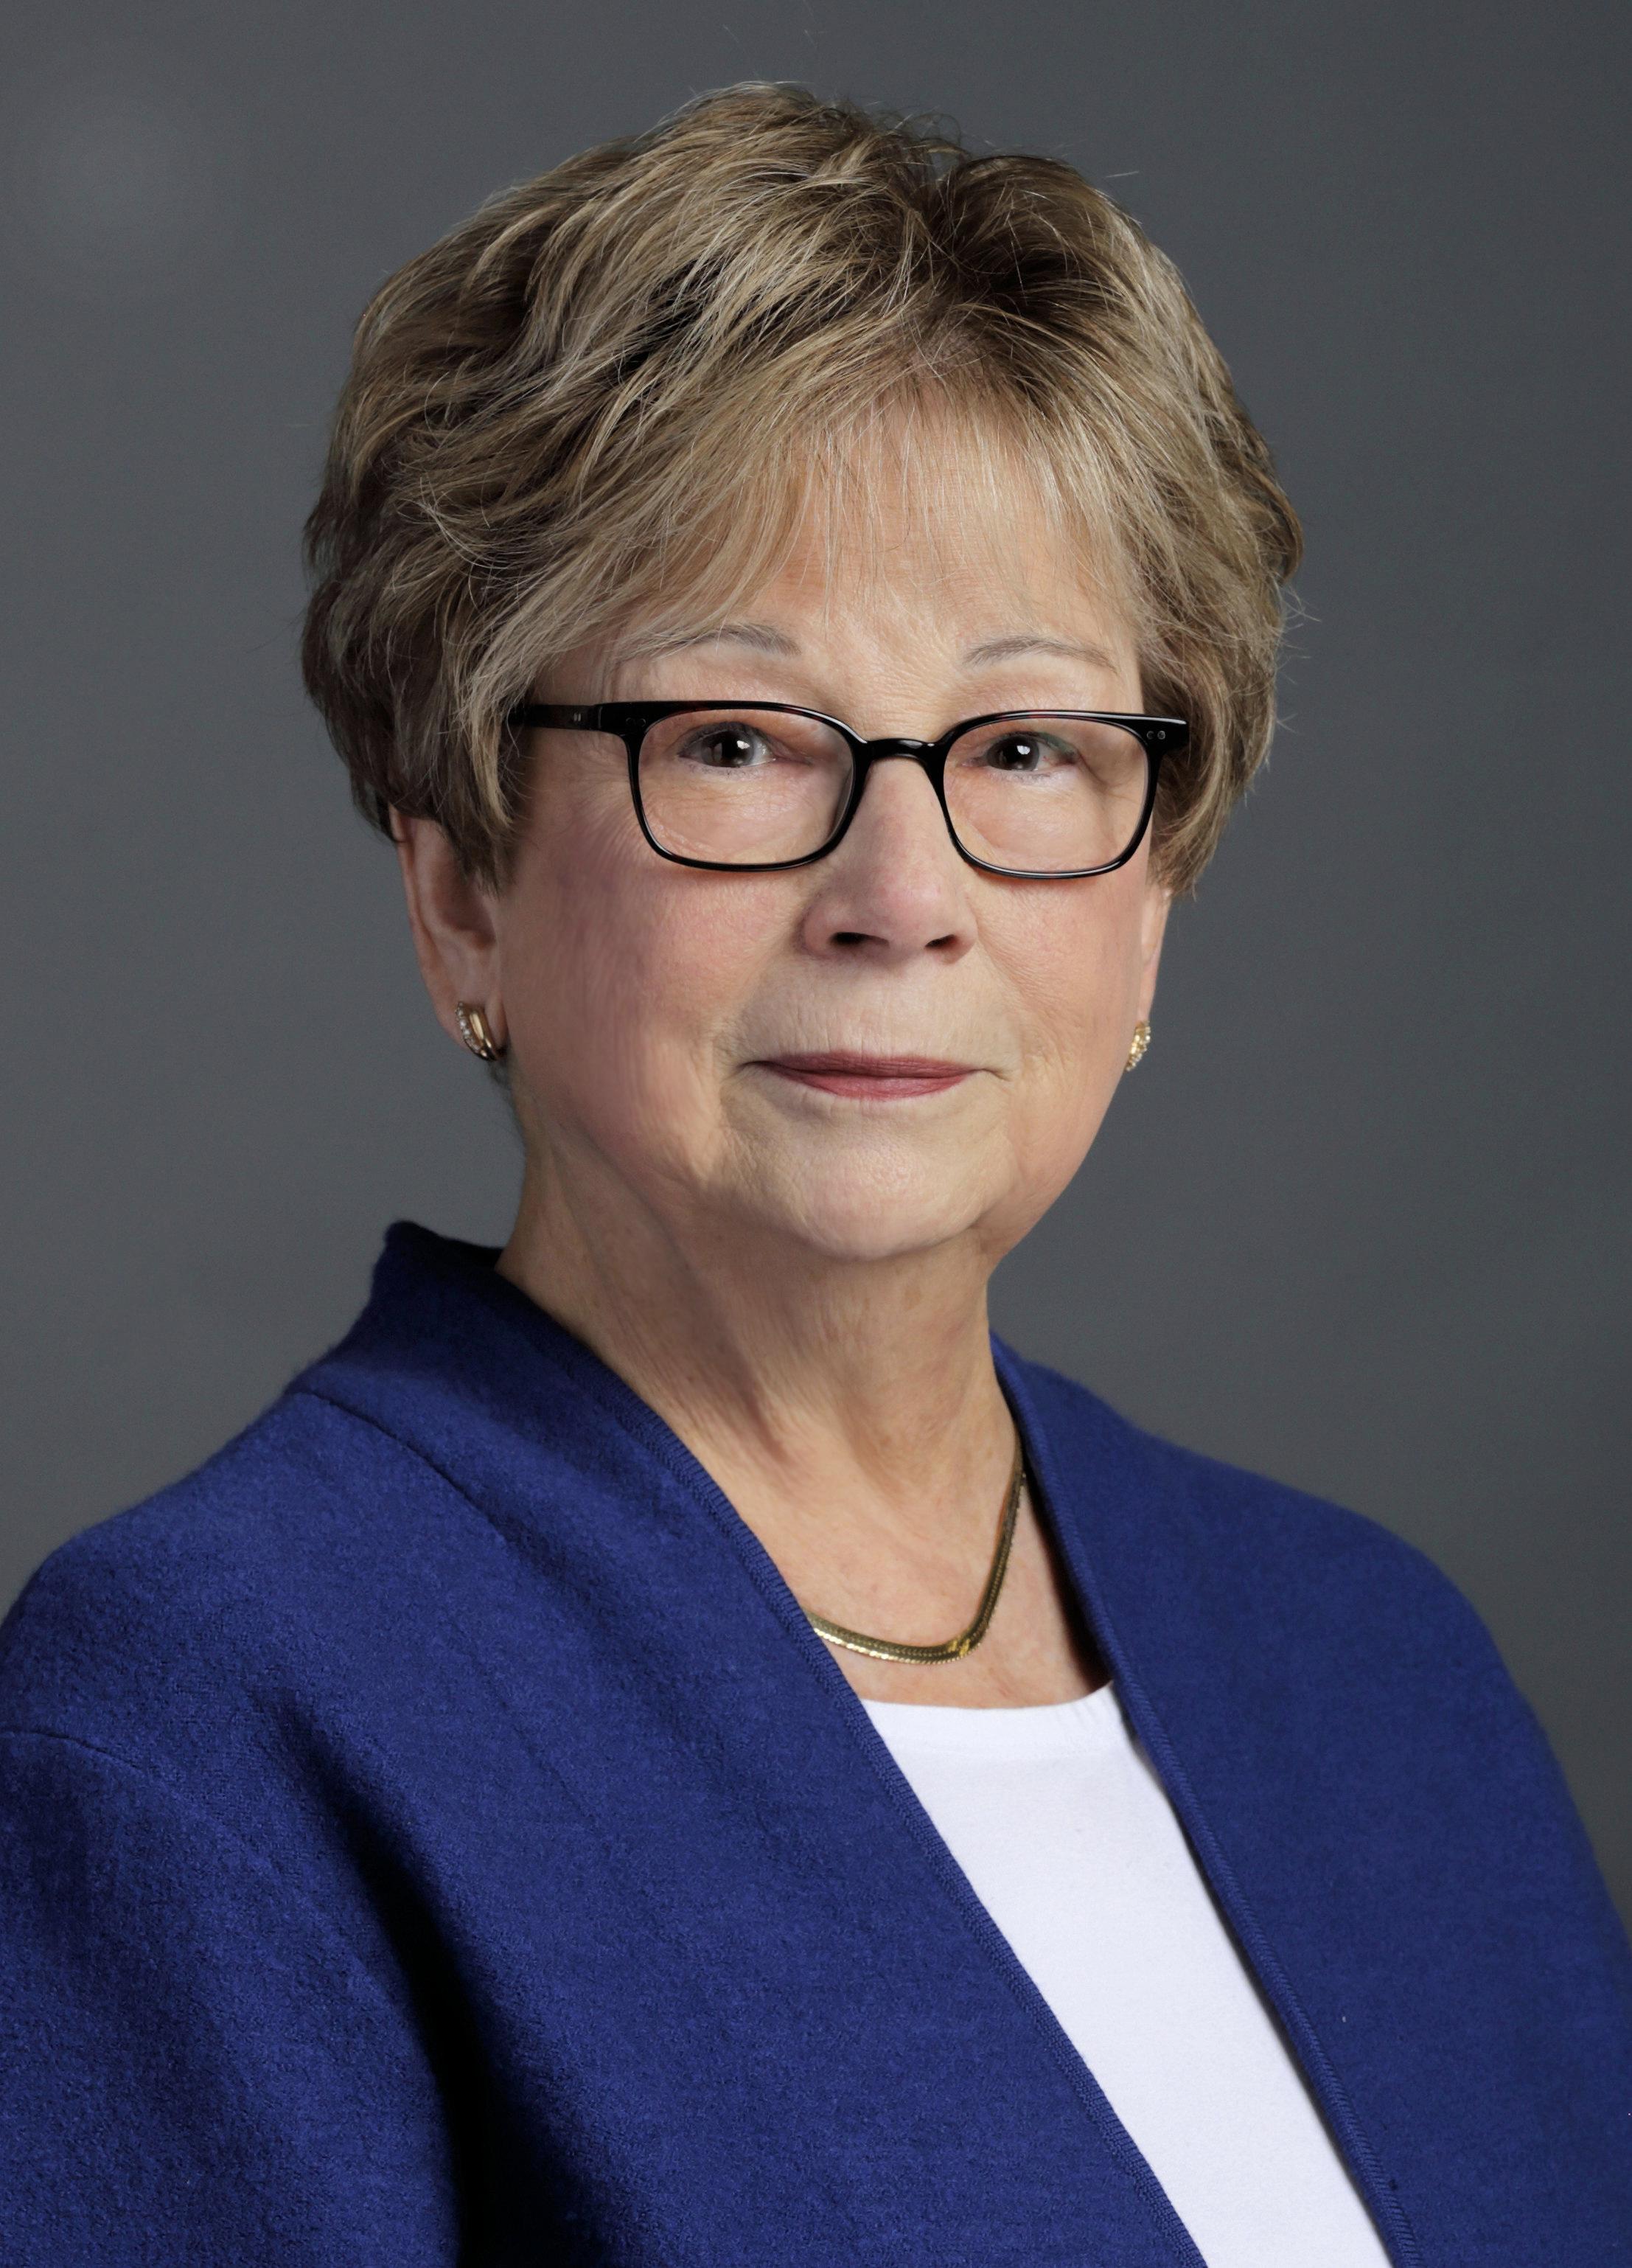 Barbara Dzur